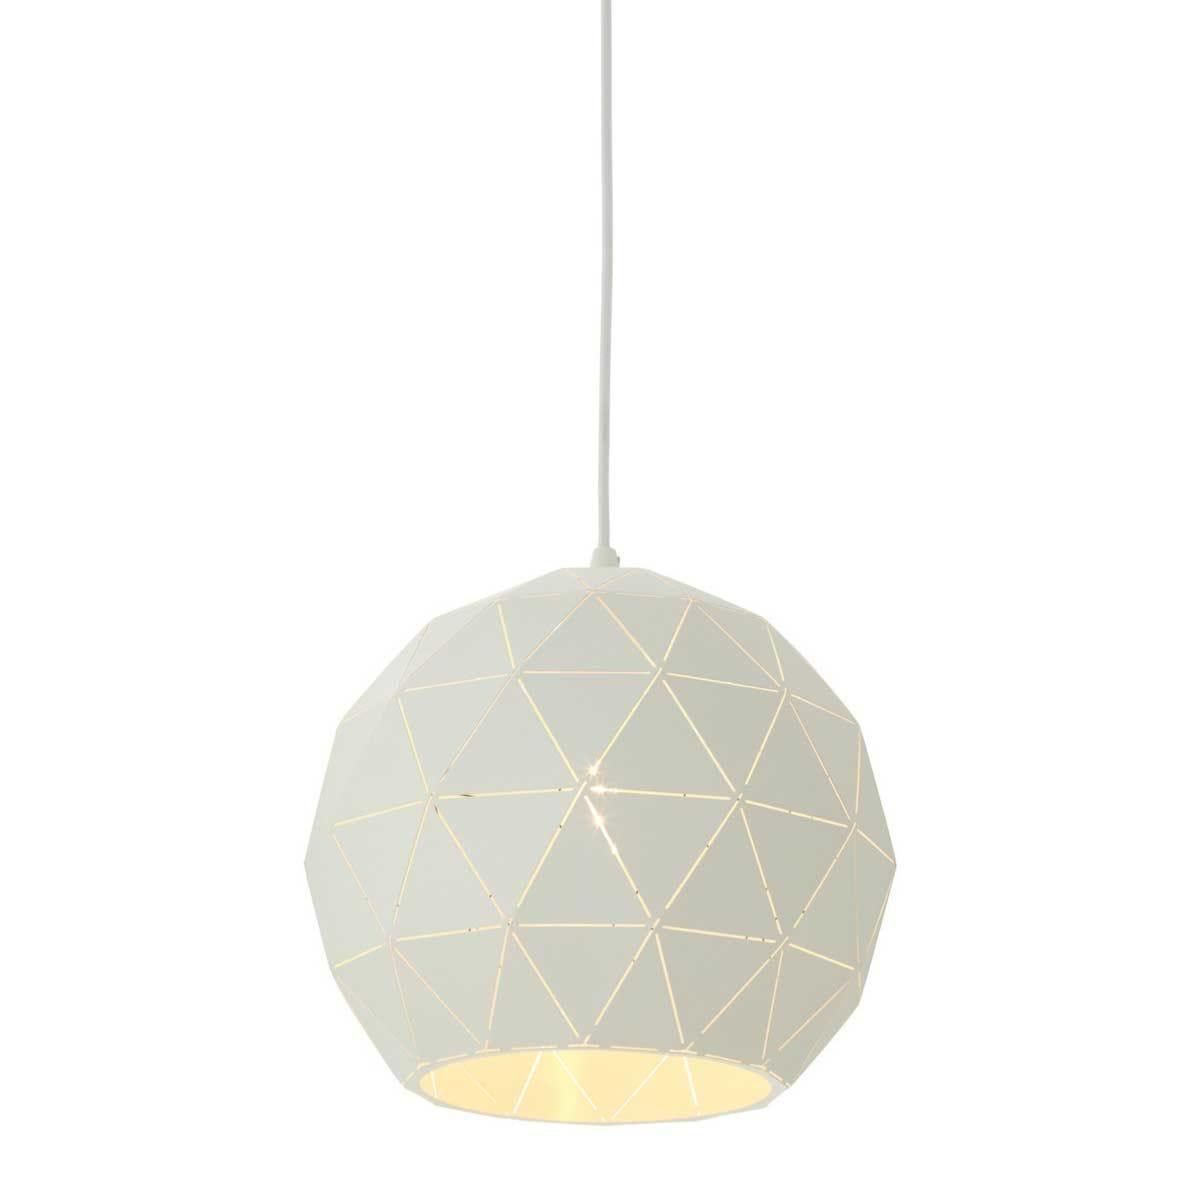 Premier Housewares Small Mateo Pendant Ceiling Light - White